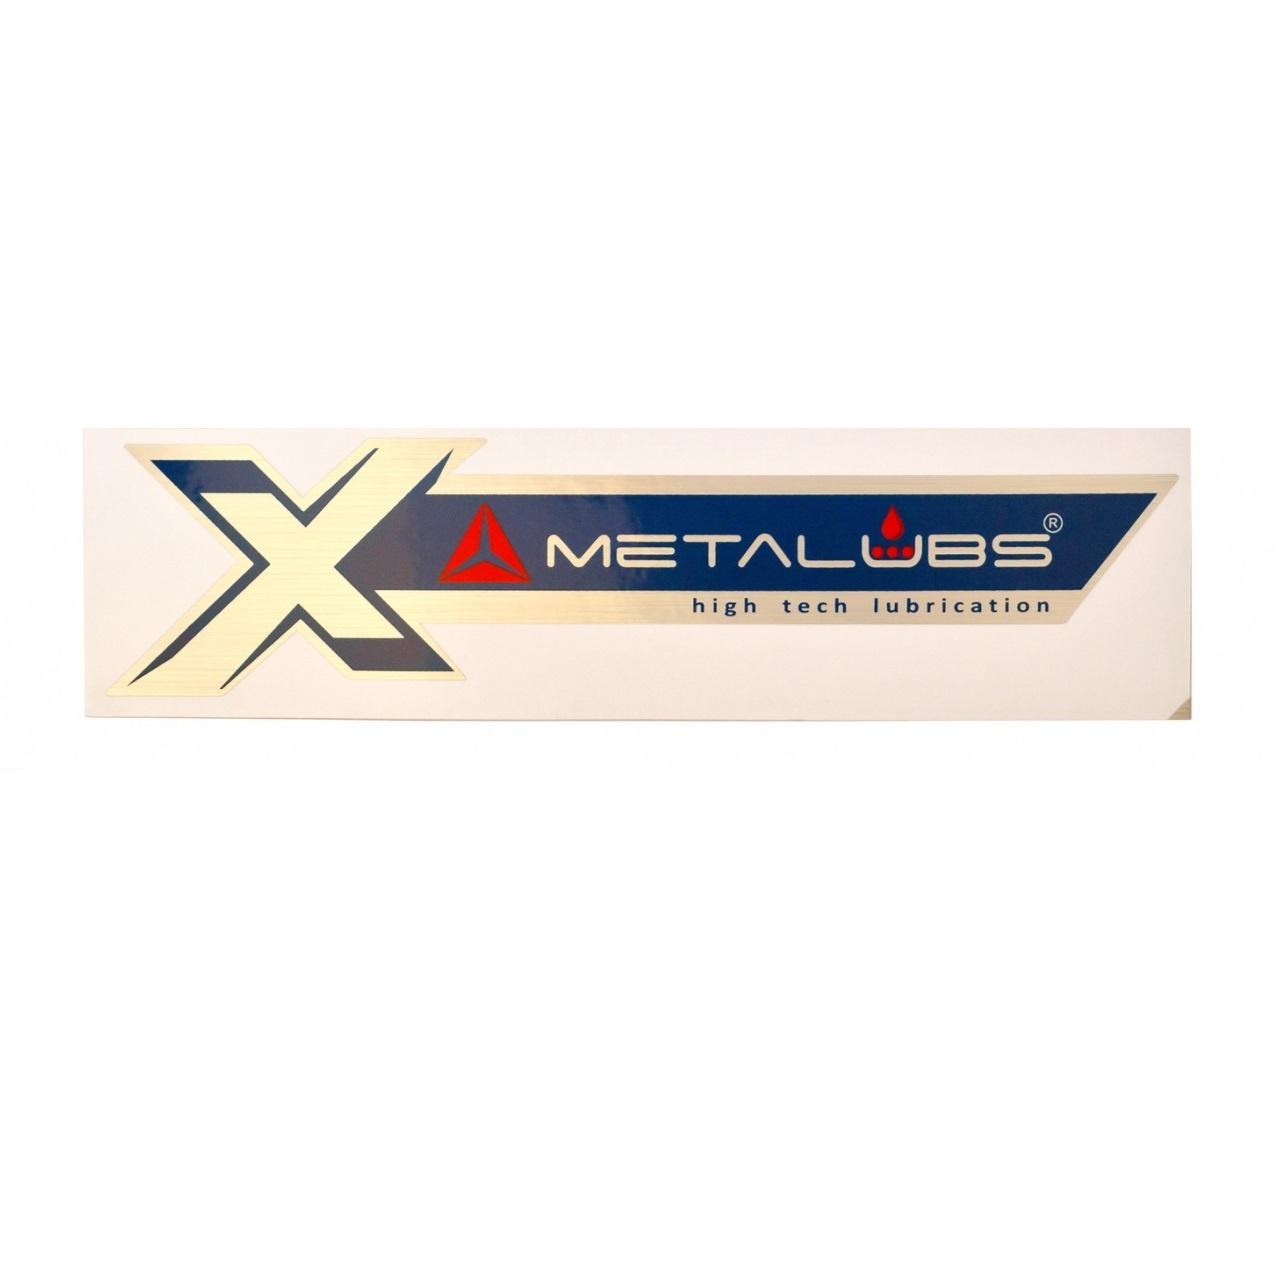 Metalubs sticker 22 × 6 cm